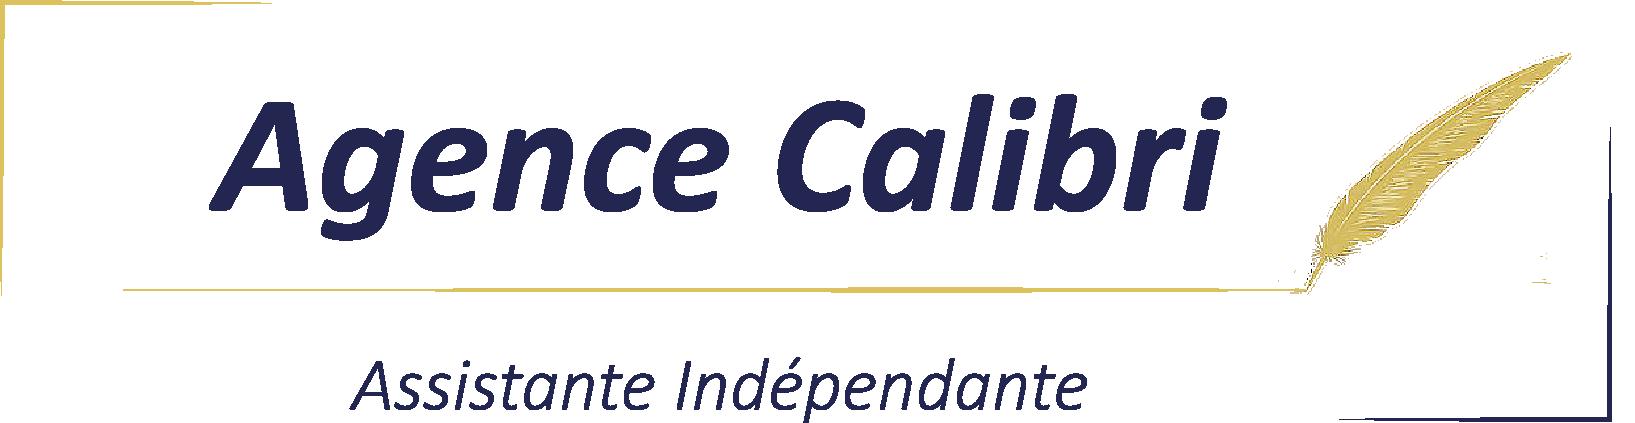 Agence Calibri